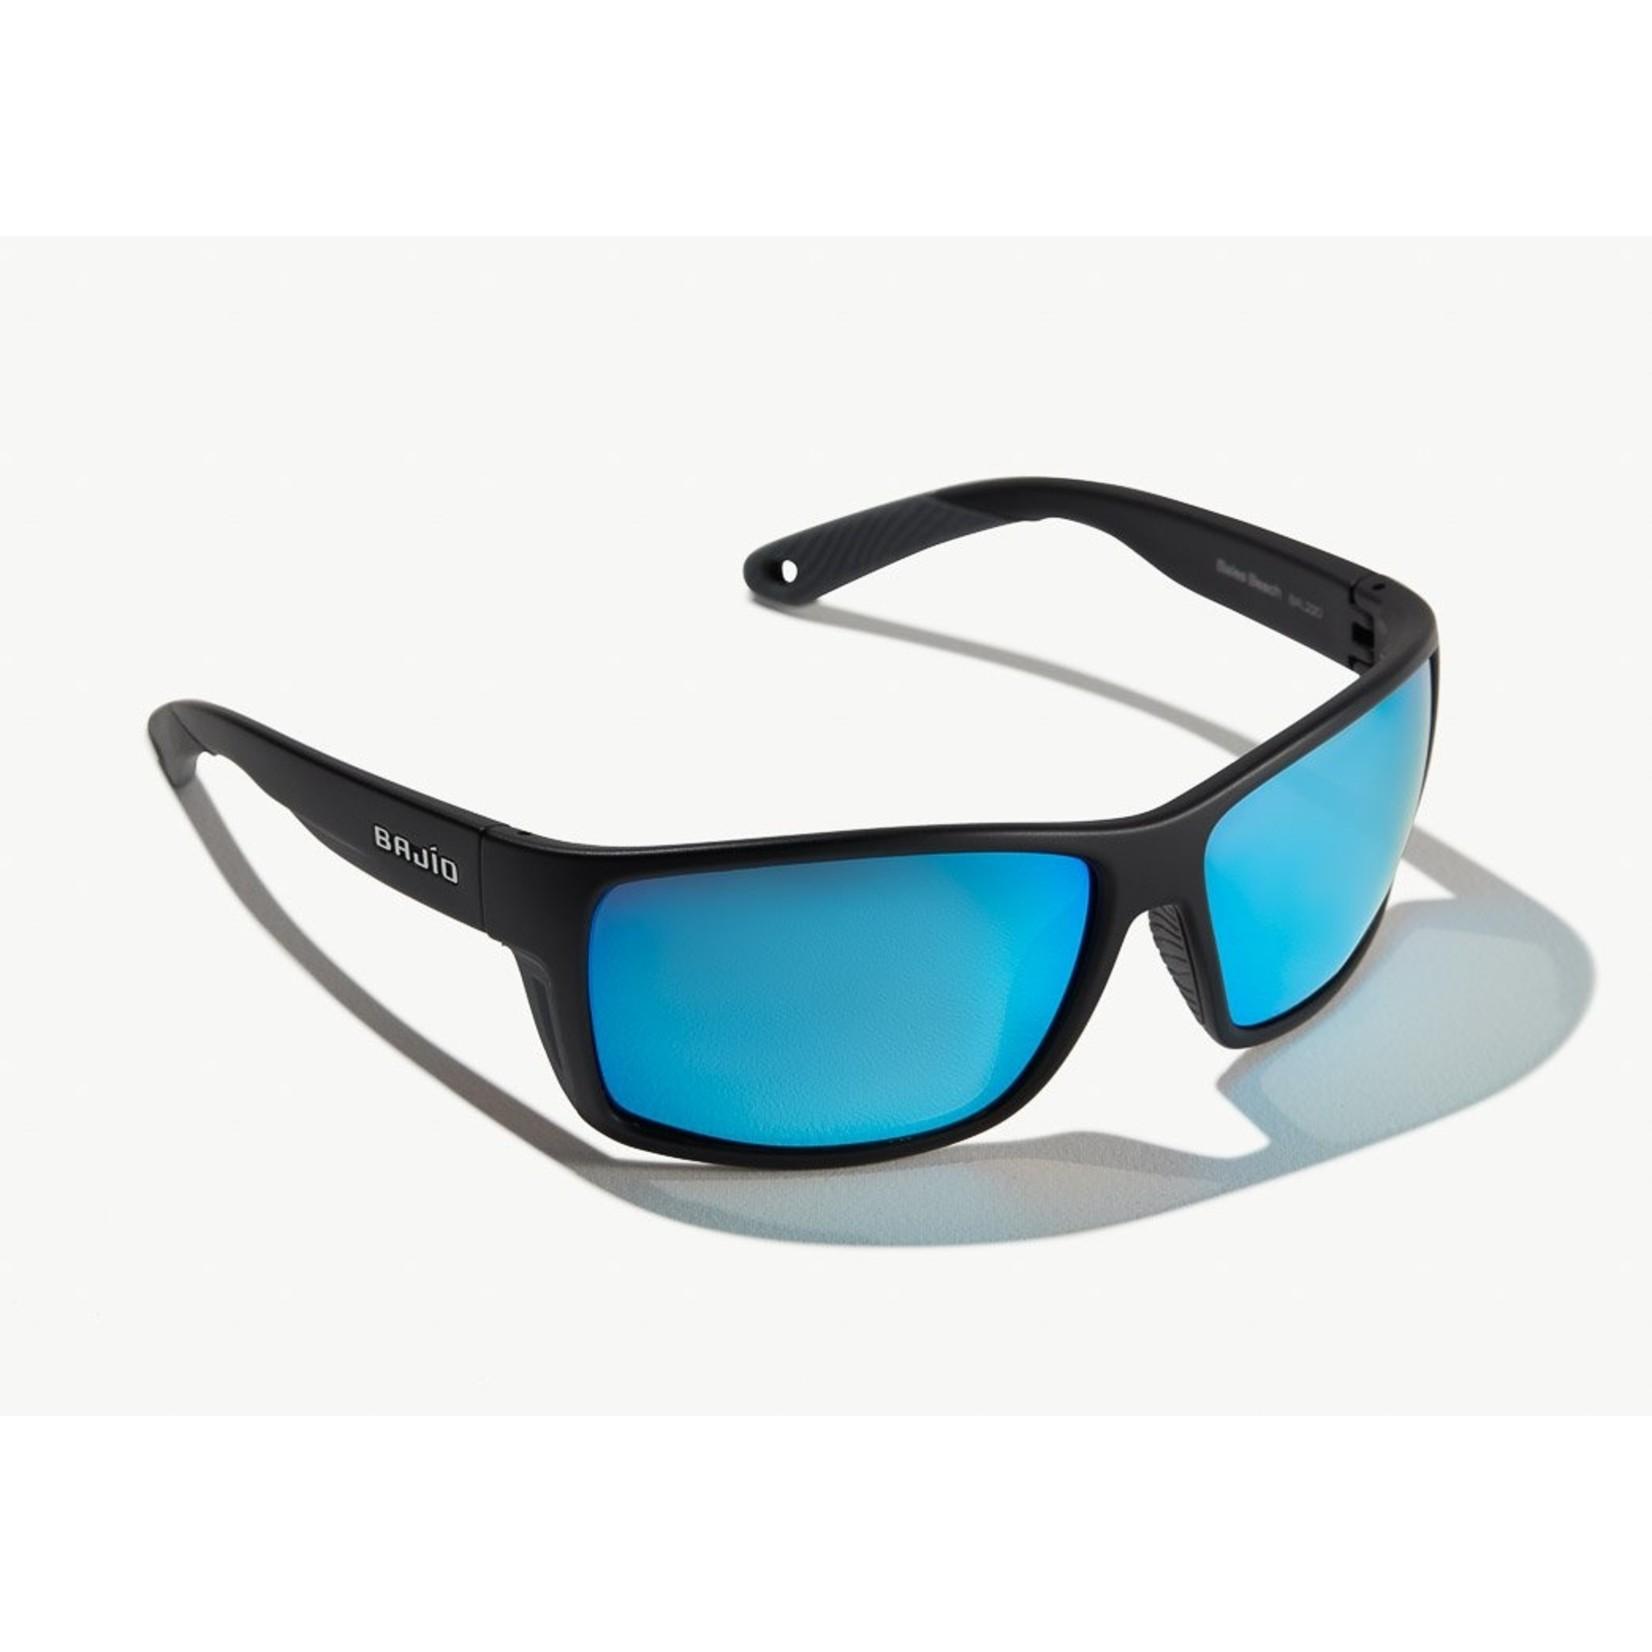 Bajio Bajio Bales Beach Polarized Sunglasses